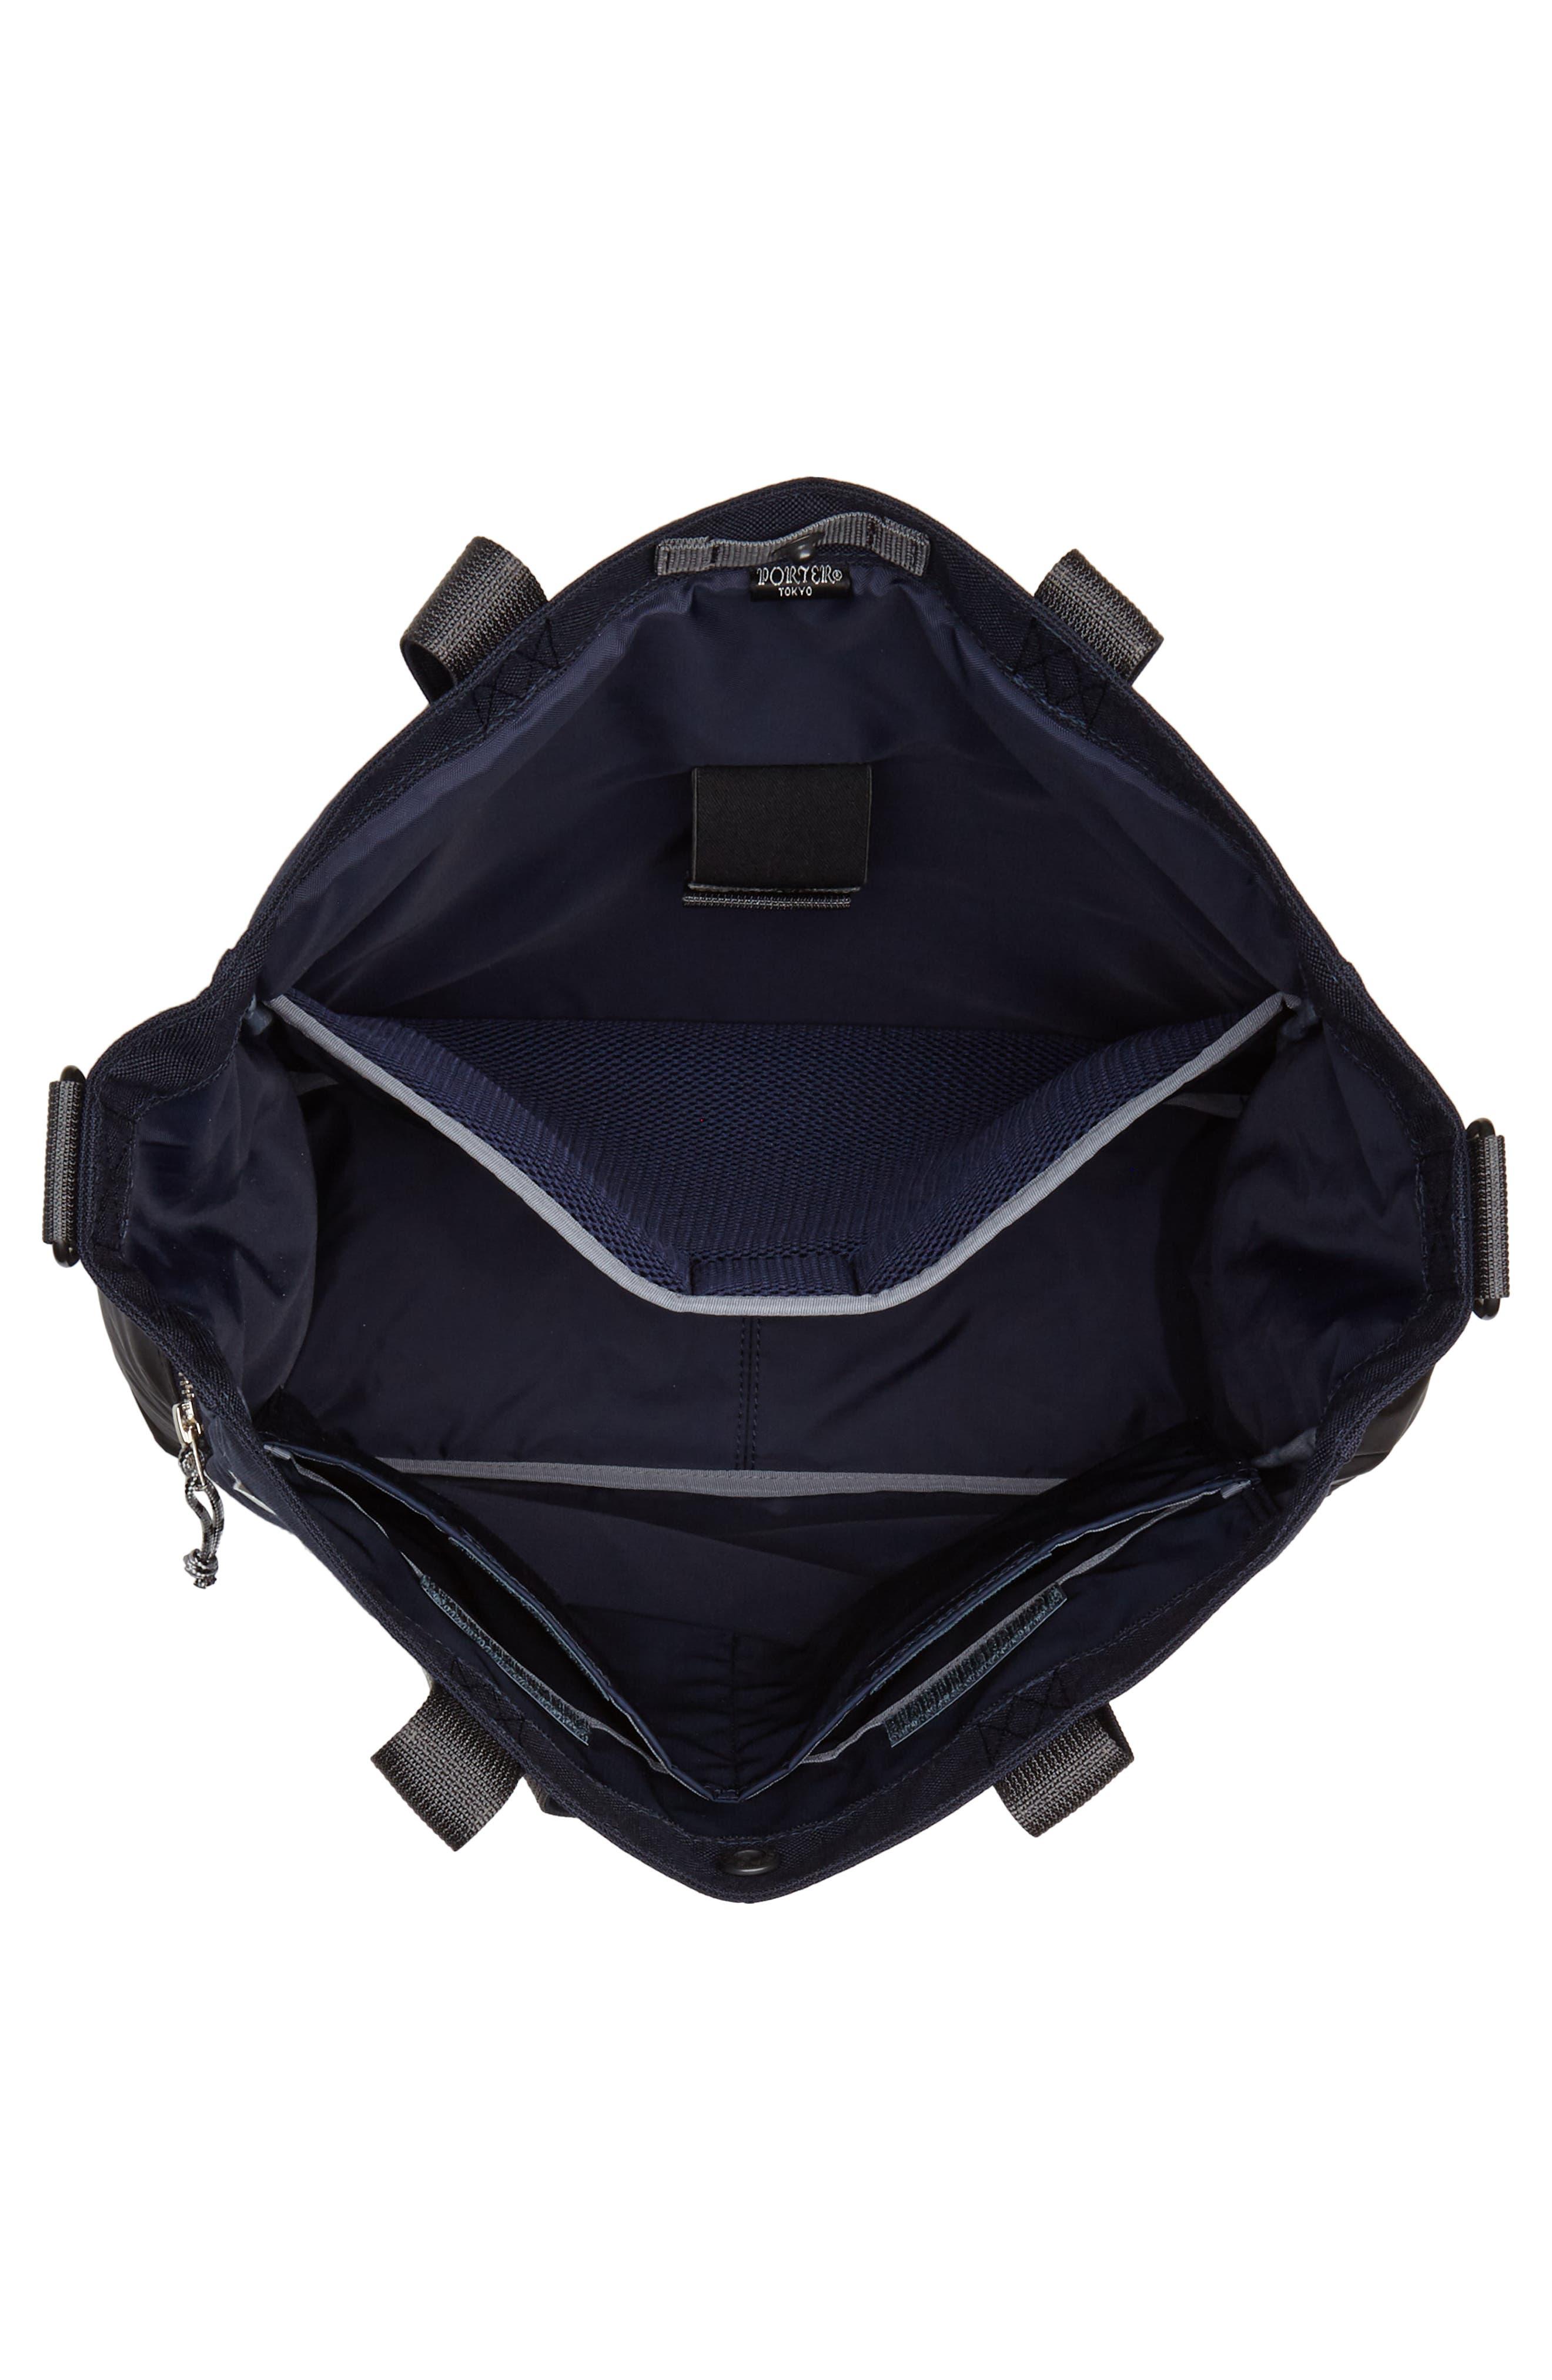 Porter-Yoshida & Co. Hype Tote Bag,                             Alternate thumbnail 4, color,                             Navy/ Black